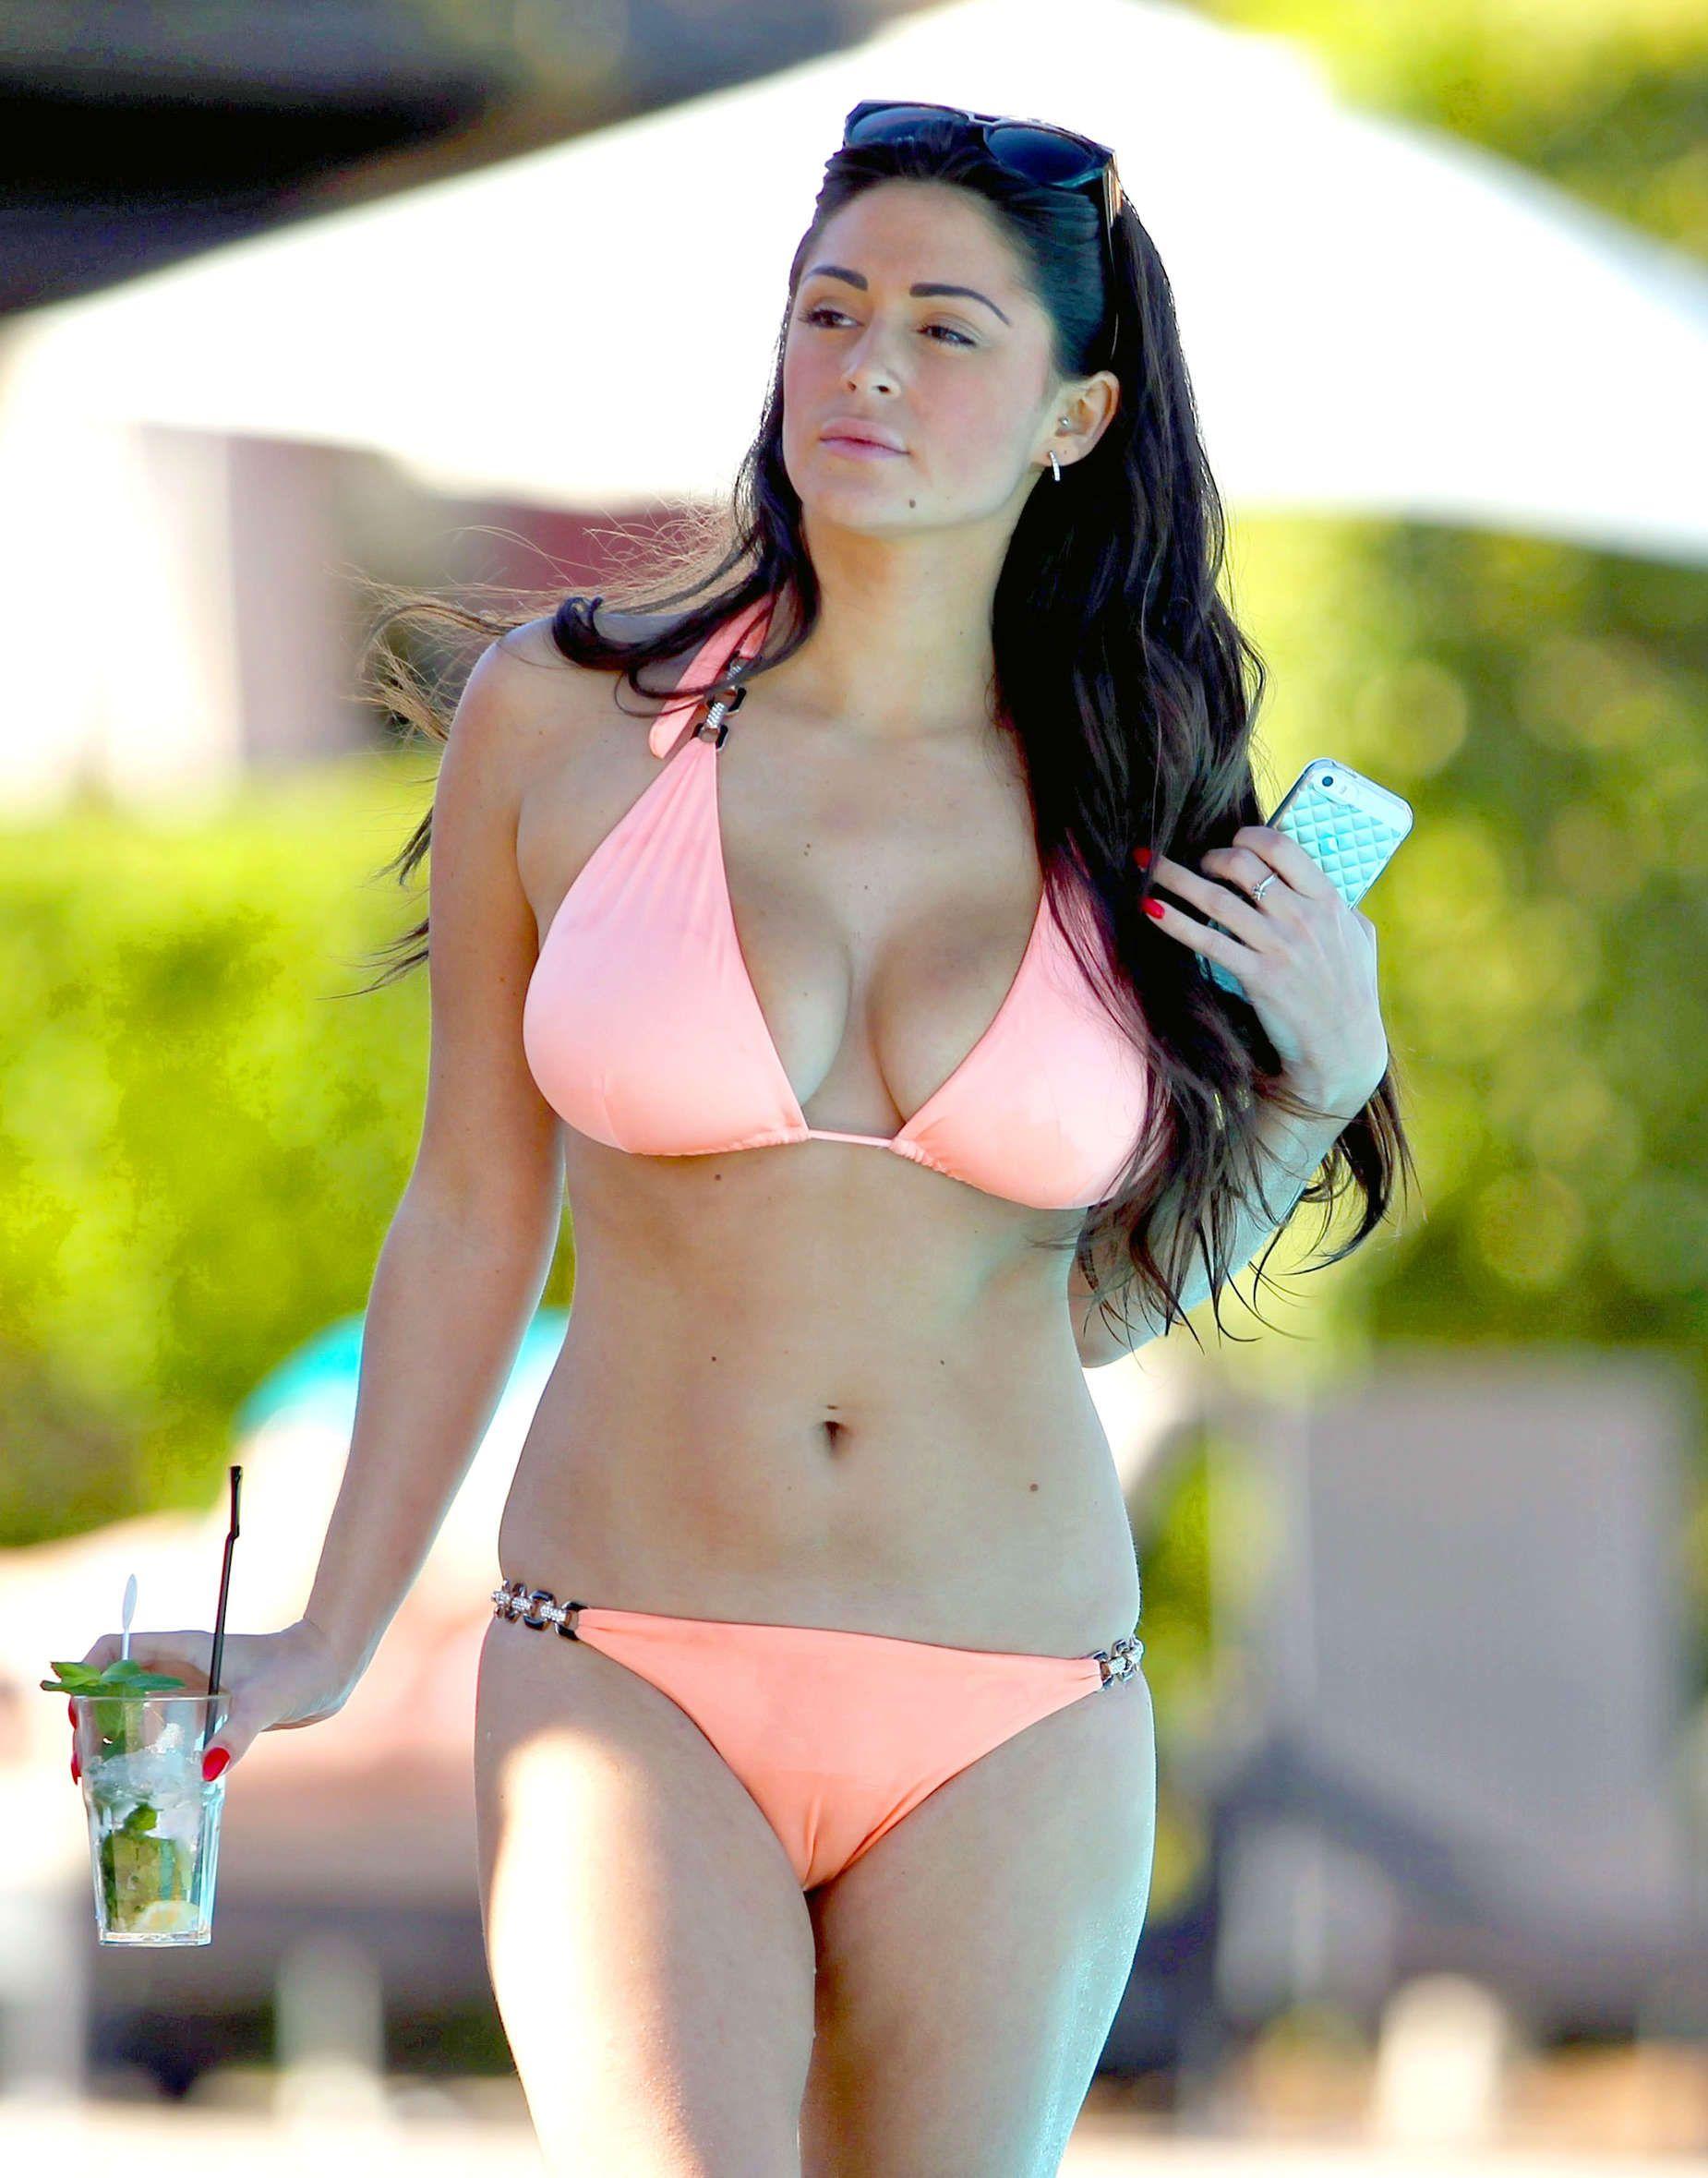 Casey batchelor sexy 6 nude (22 photo), Cleavage Celebrites fotos